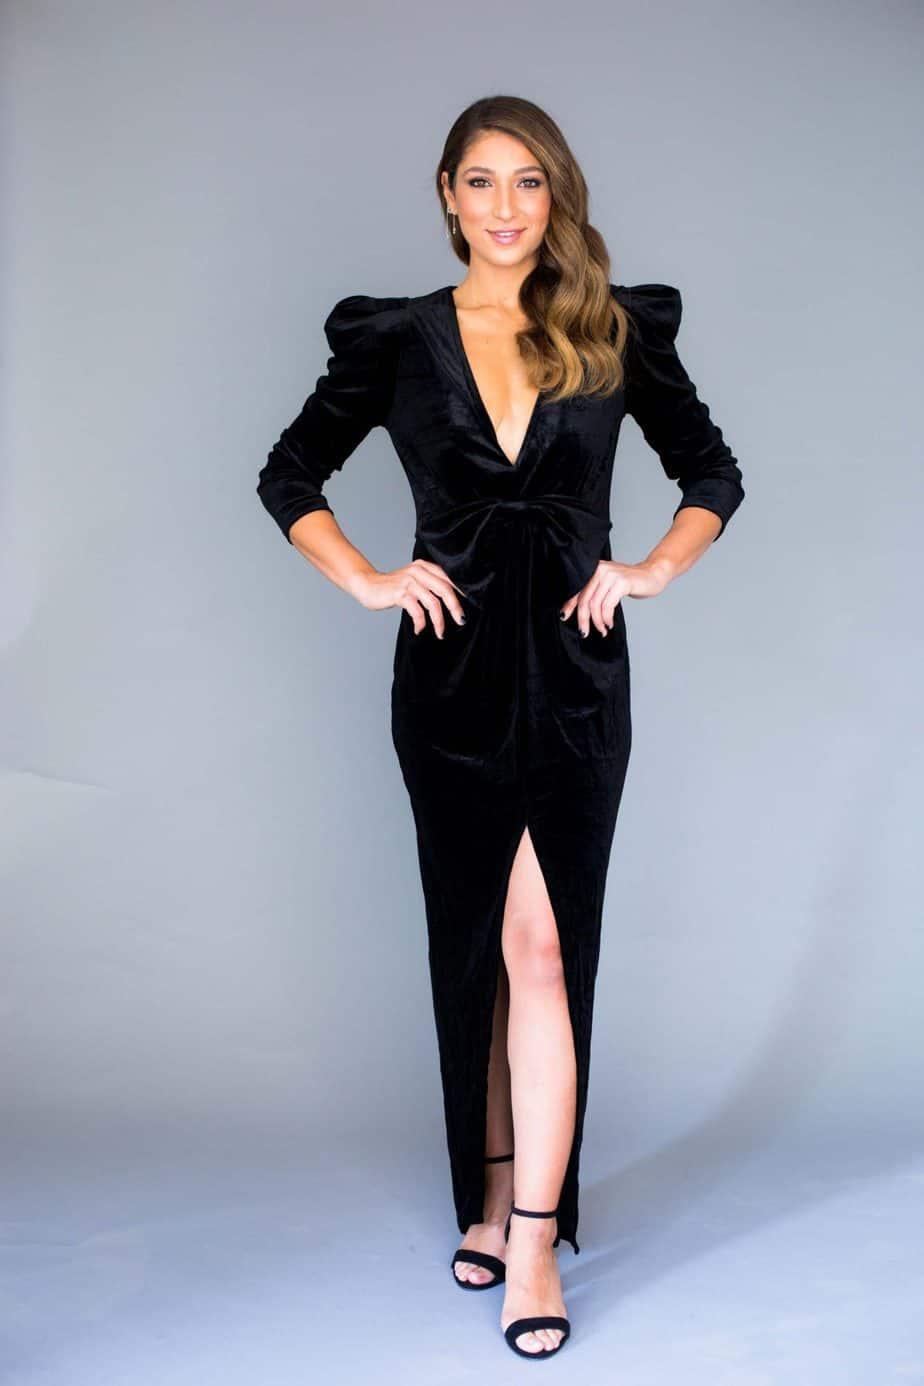 Oscar velvet dress 579שח לאמה רו כצנלסון 61 גבעתיים דוגמנית נגה ברנס צילום אפרת ציון black